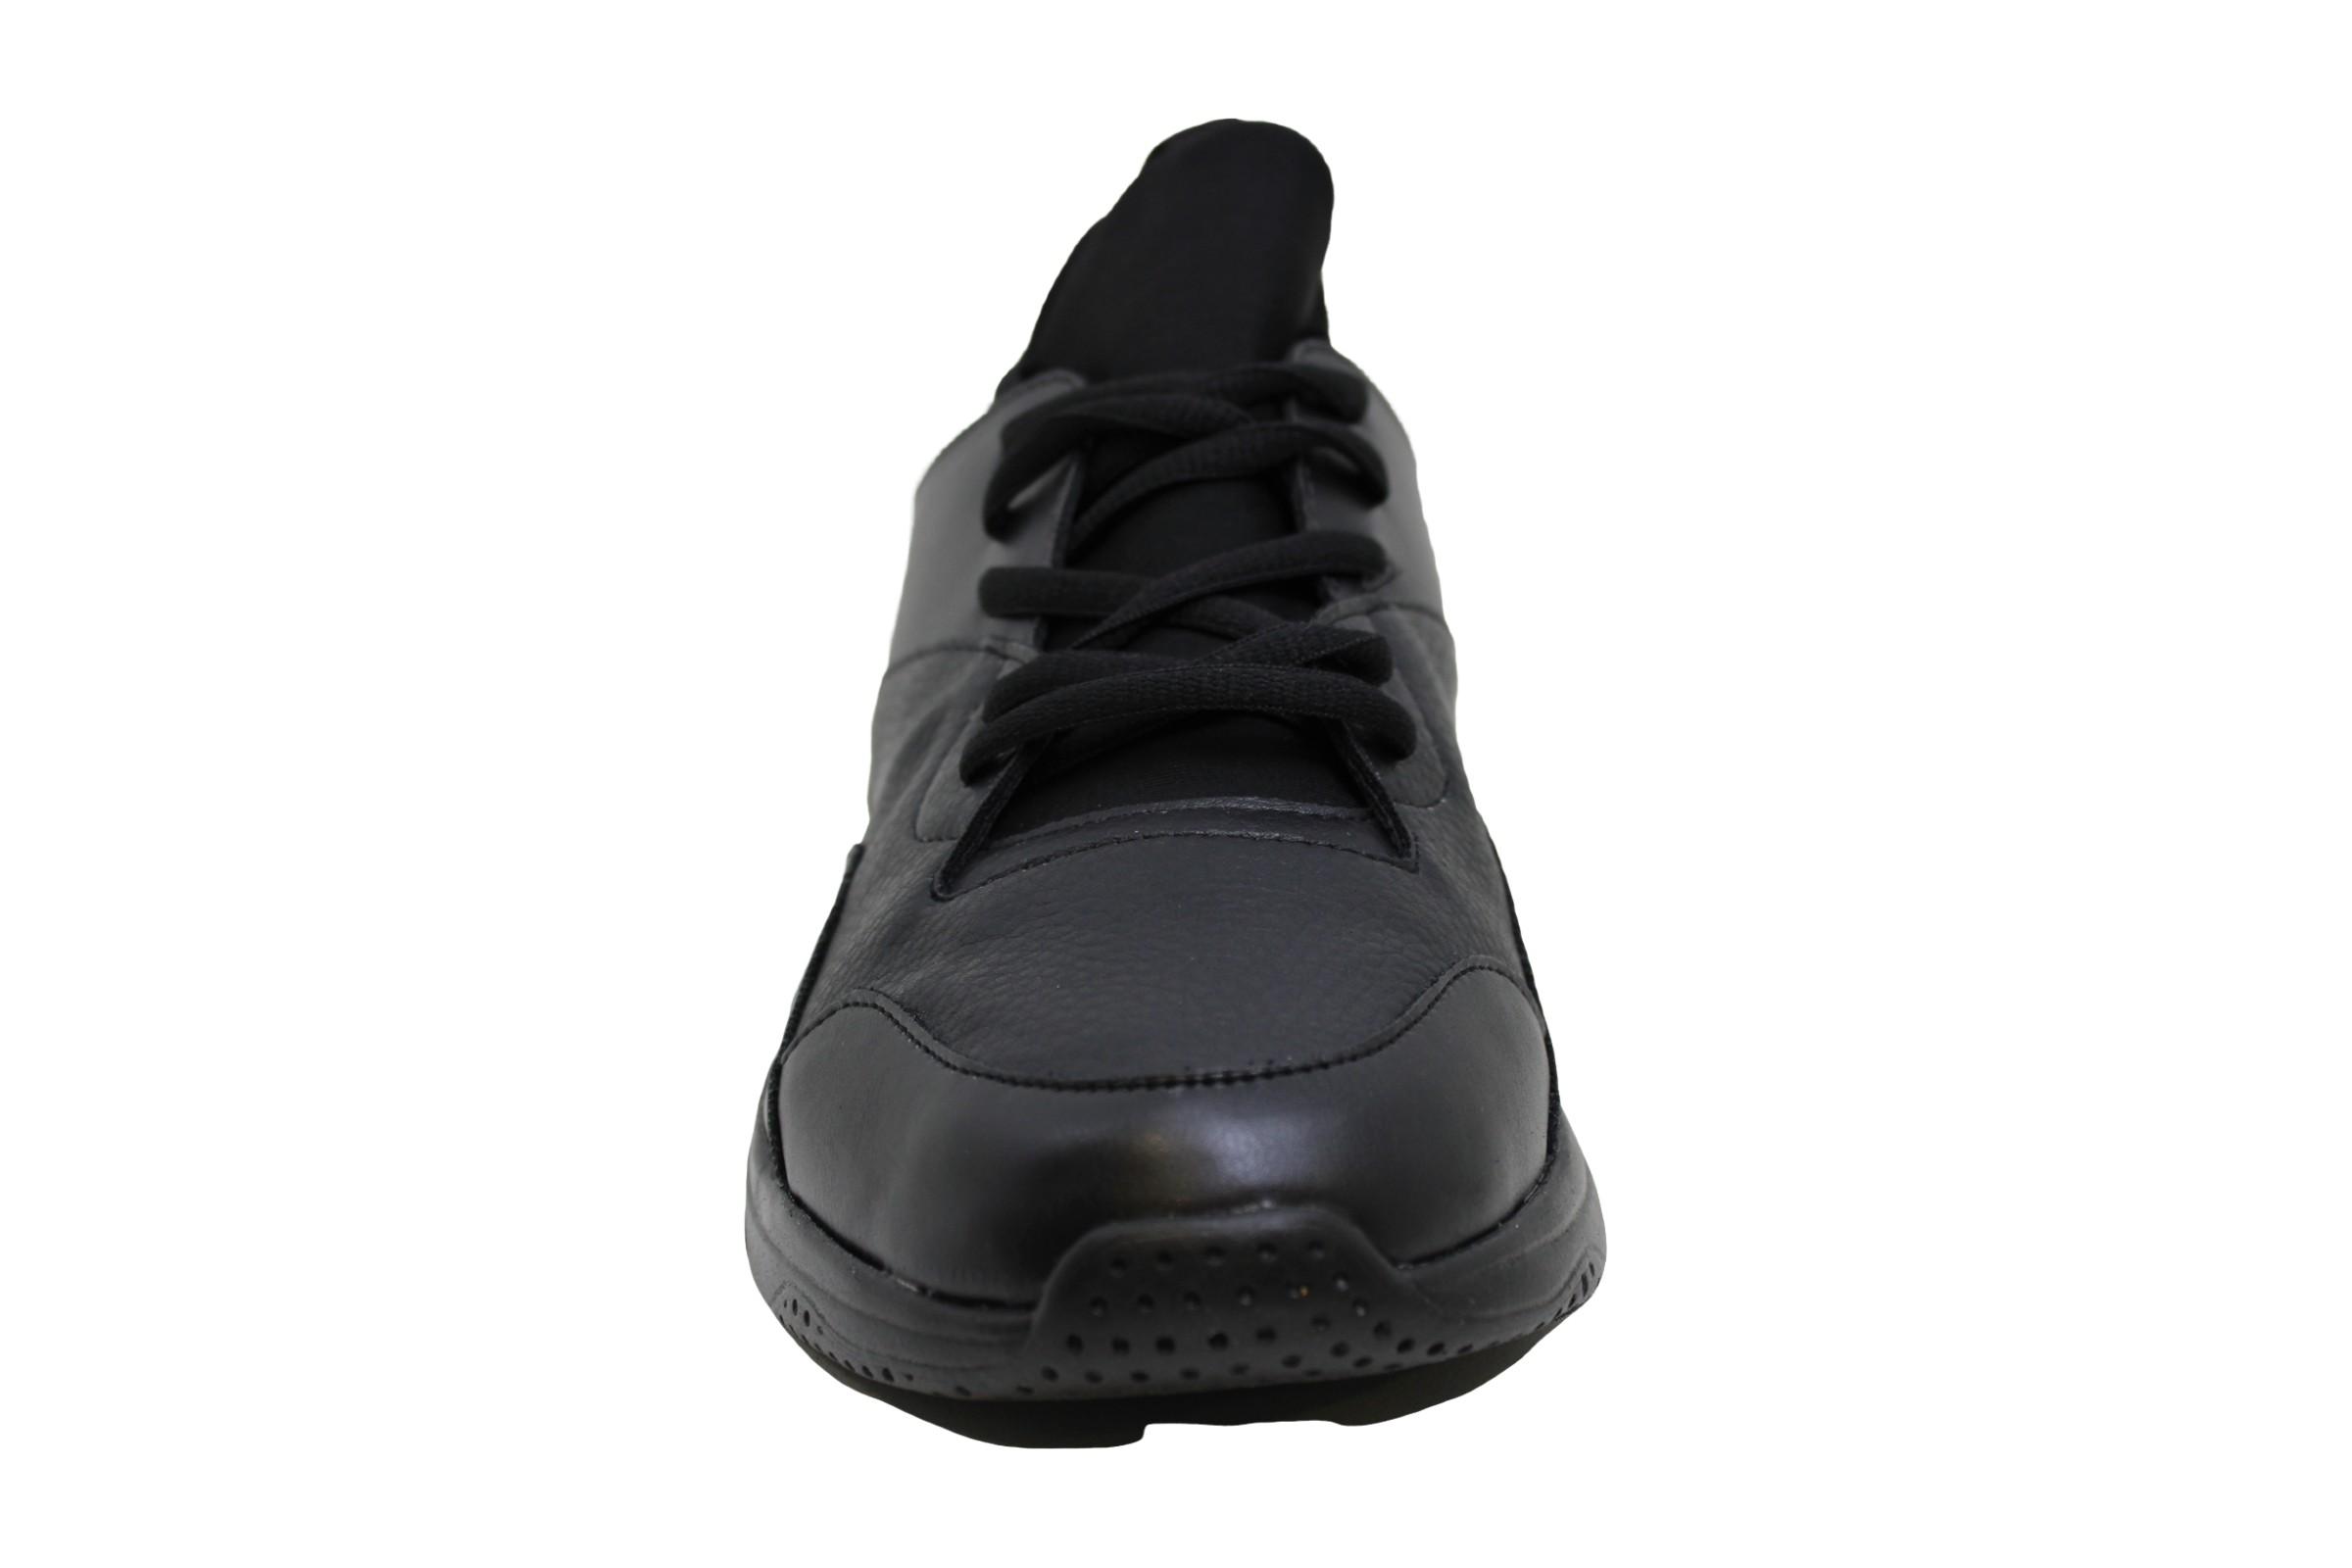 L-039-ideologie-Femme-jonaas-Low-Top-Lacets-Running-Baskets miniature 2